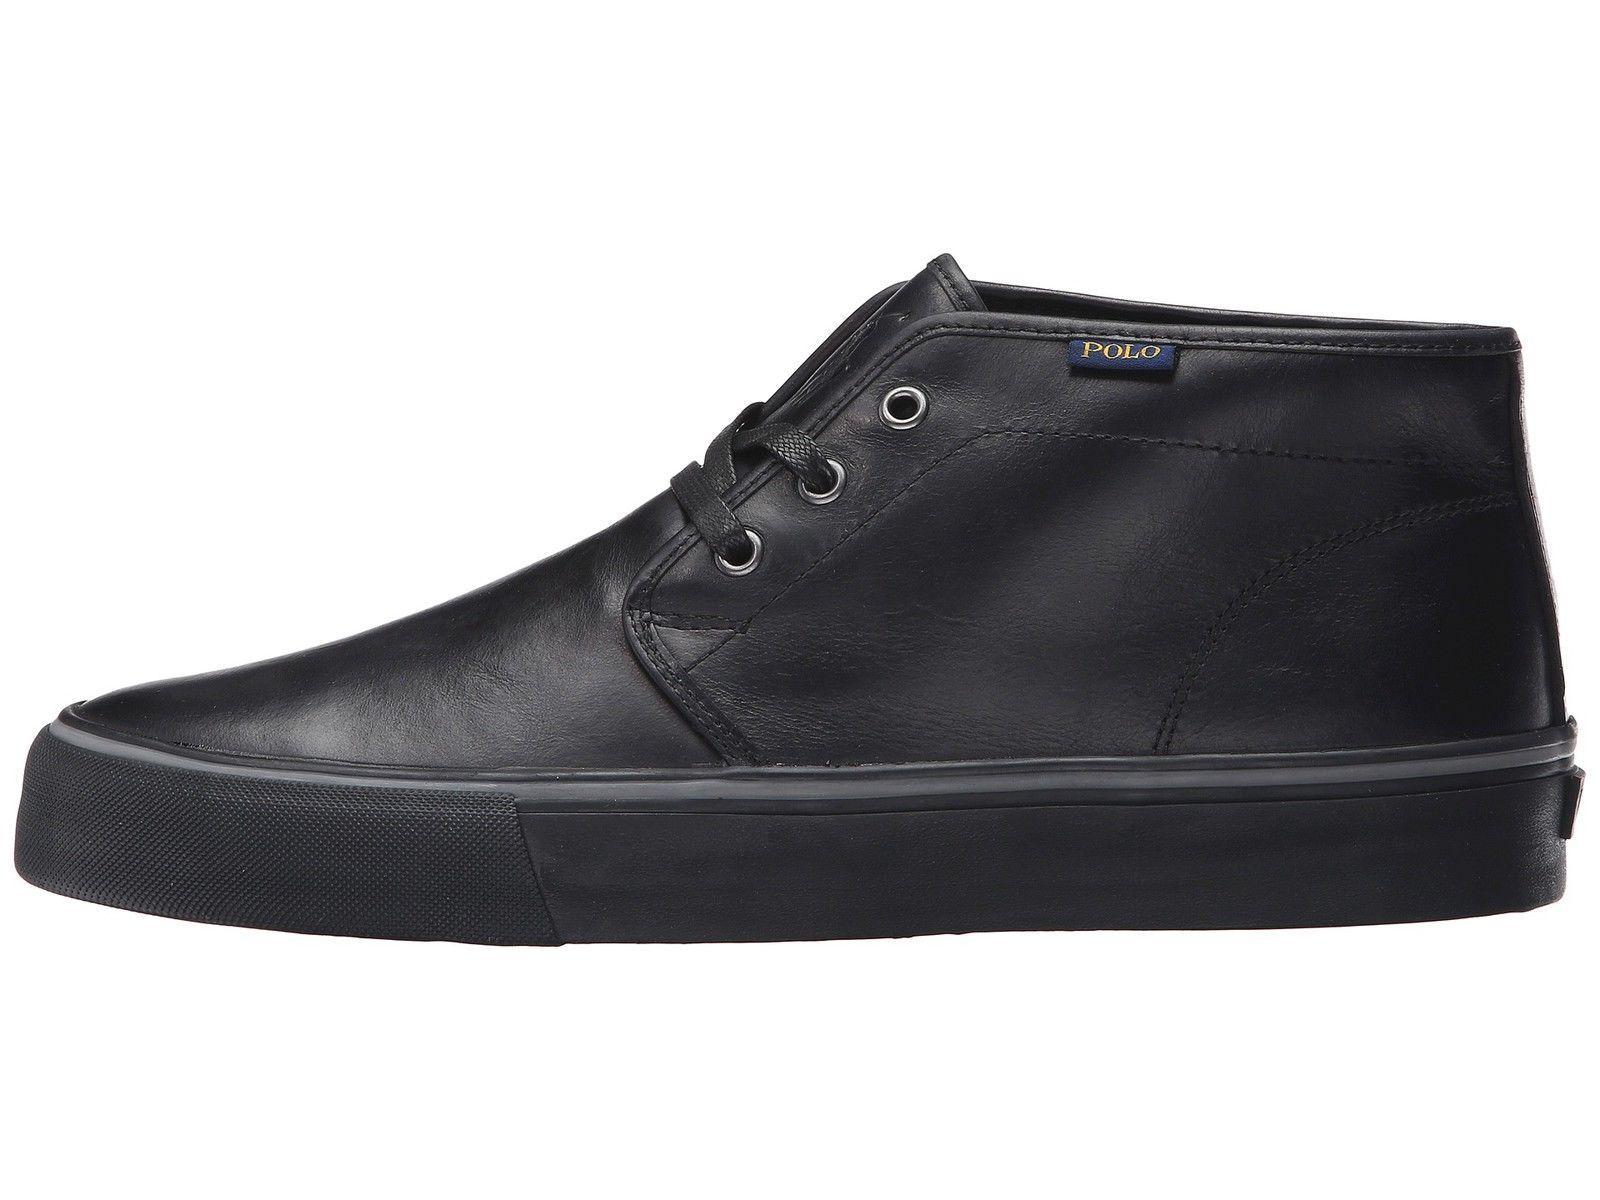 POLO RALPH LAUREN - MAYKN - Men's Chukka Ankle Boots - Black Leather - Size 10 M